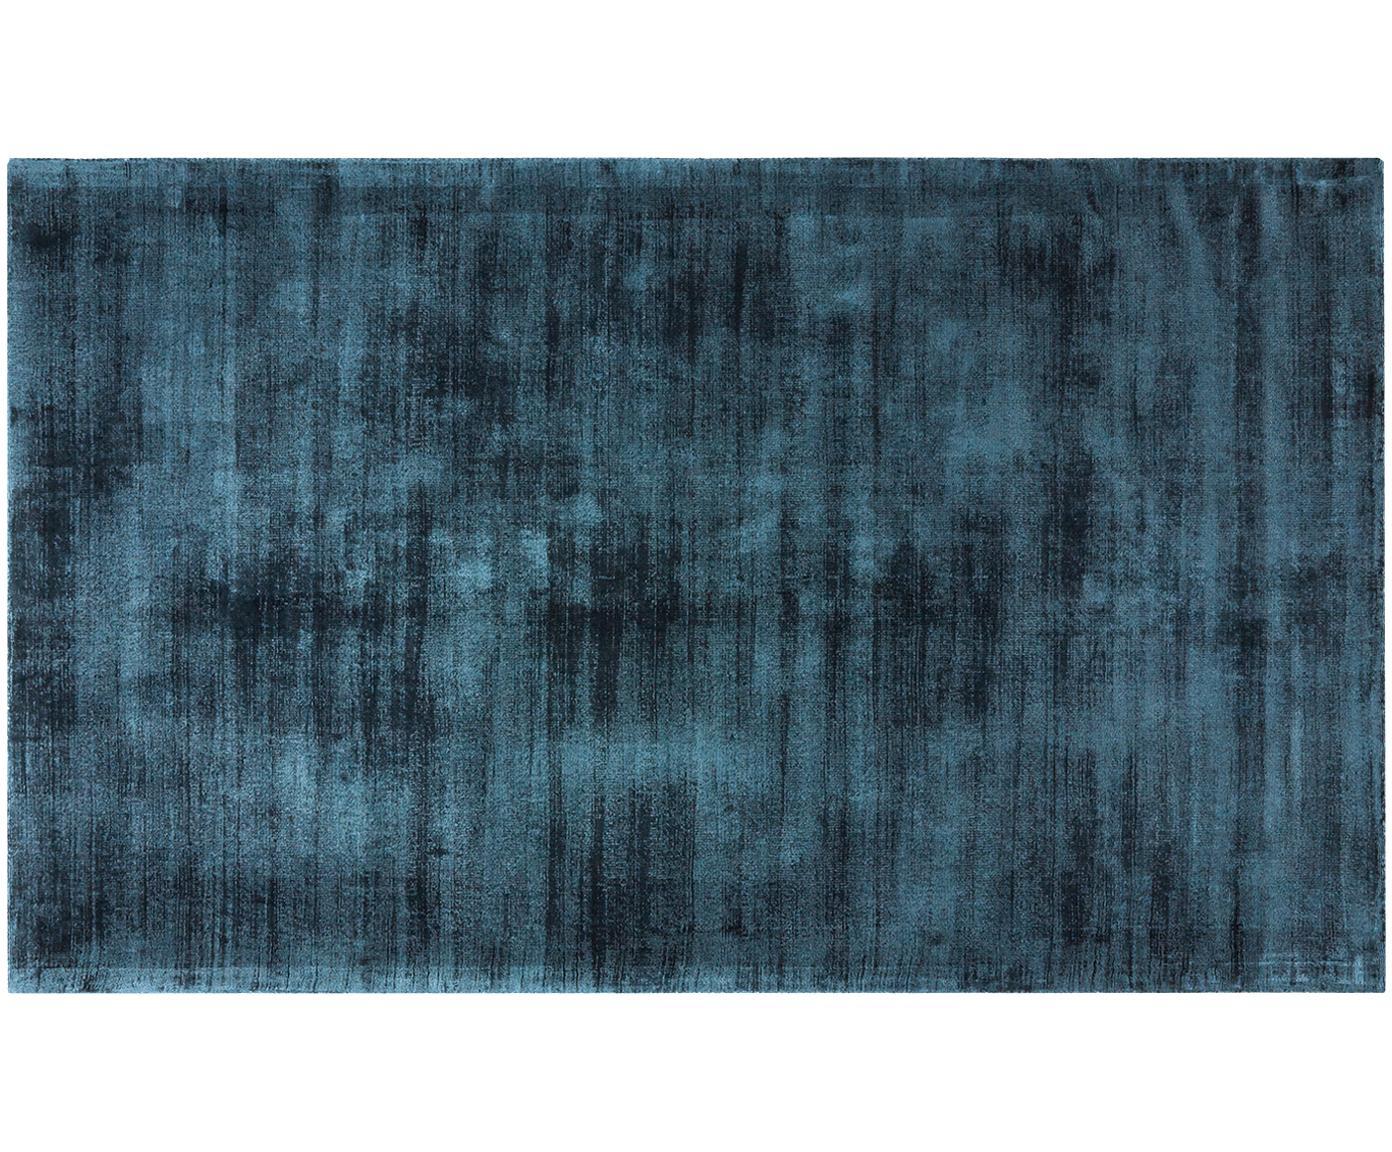 Handgewebter Viskoseteppich Jane in Petrol, Flor: 100% Viskose, Petrol, B 90 x L 150 cm (Größe XS)